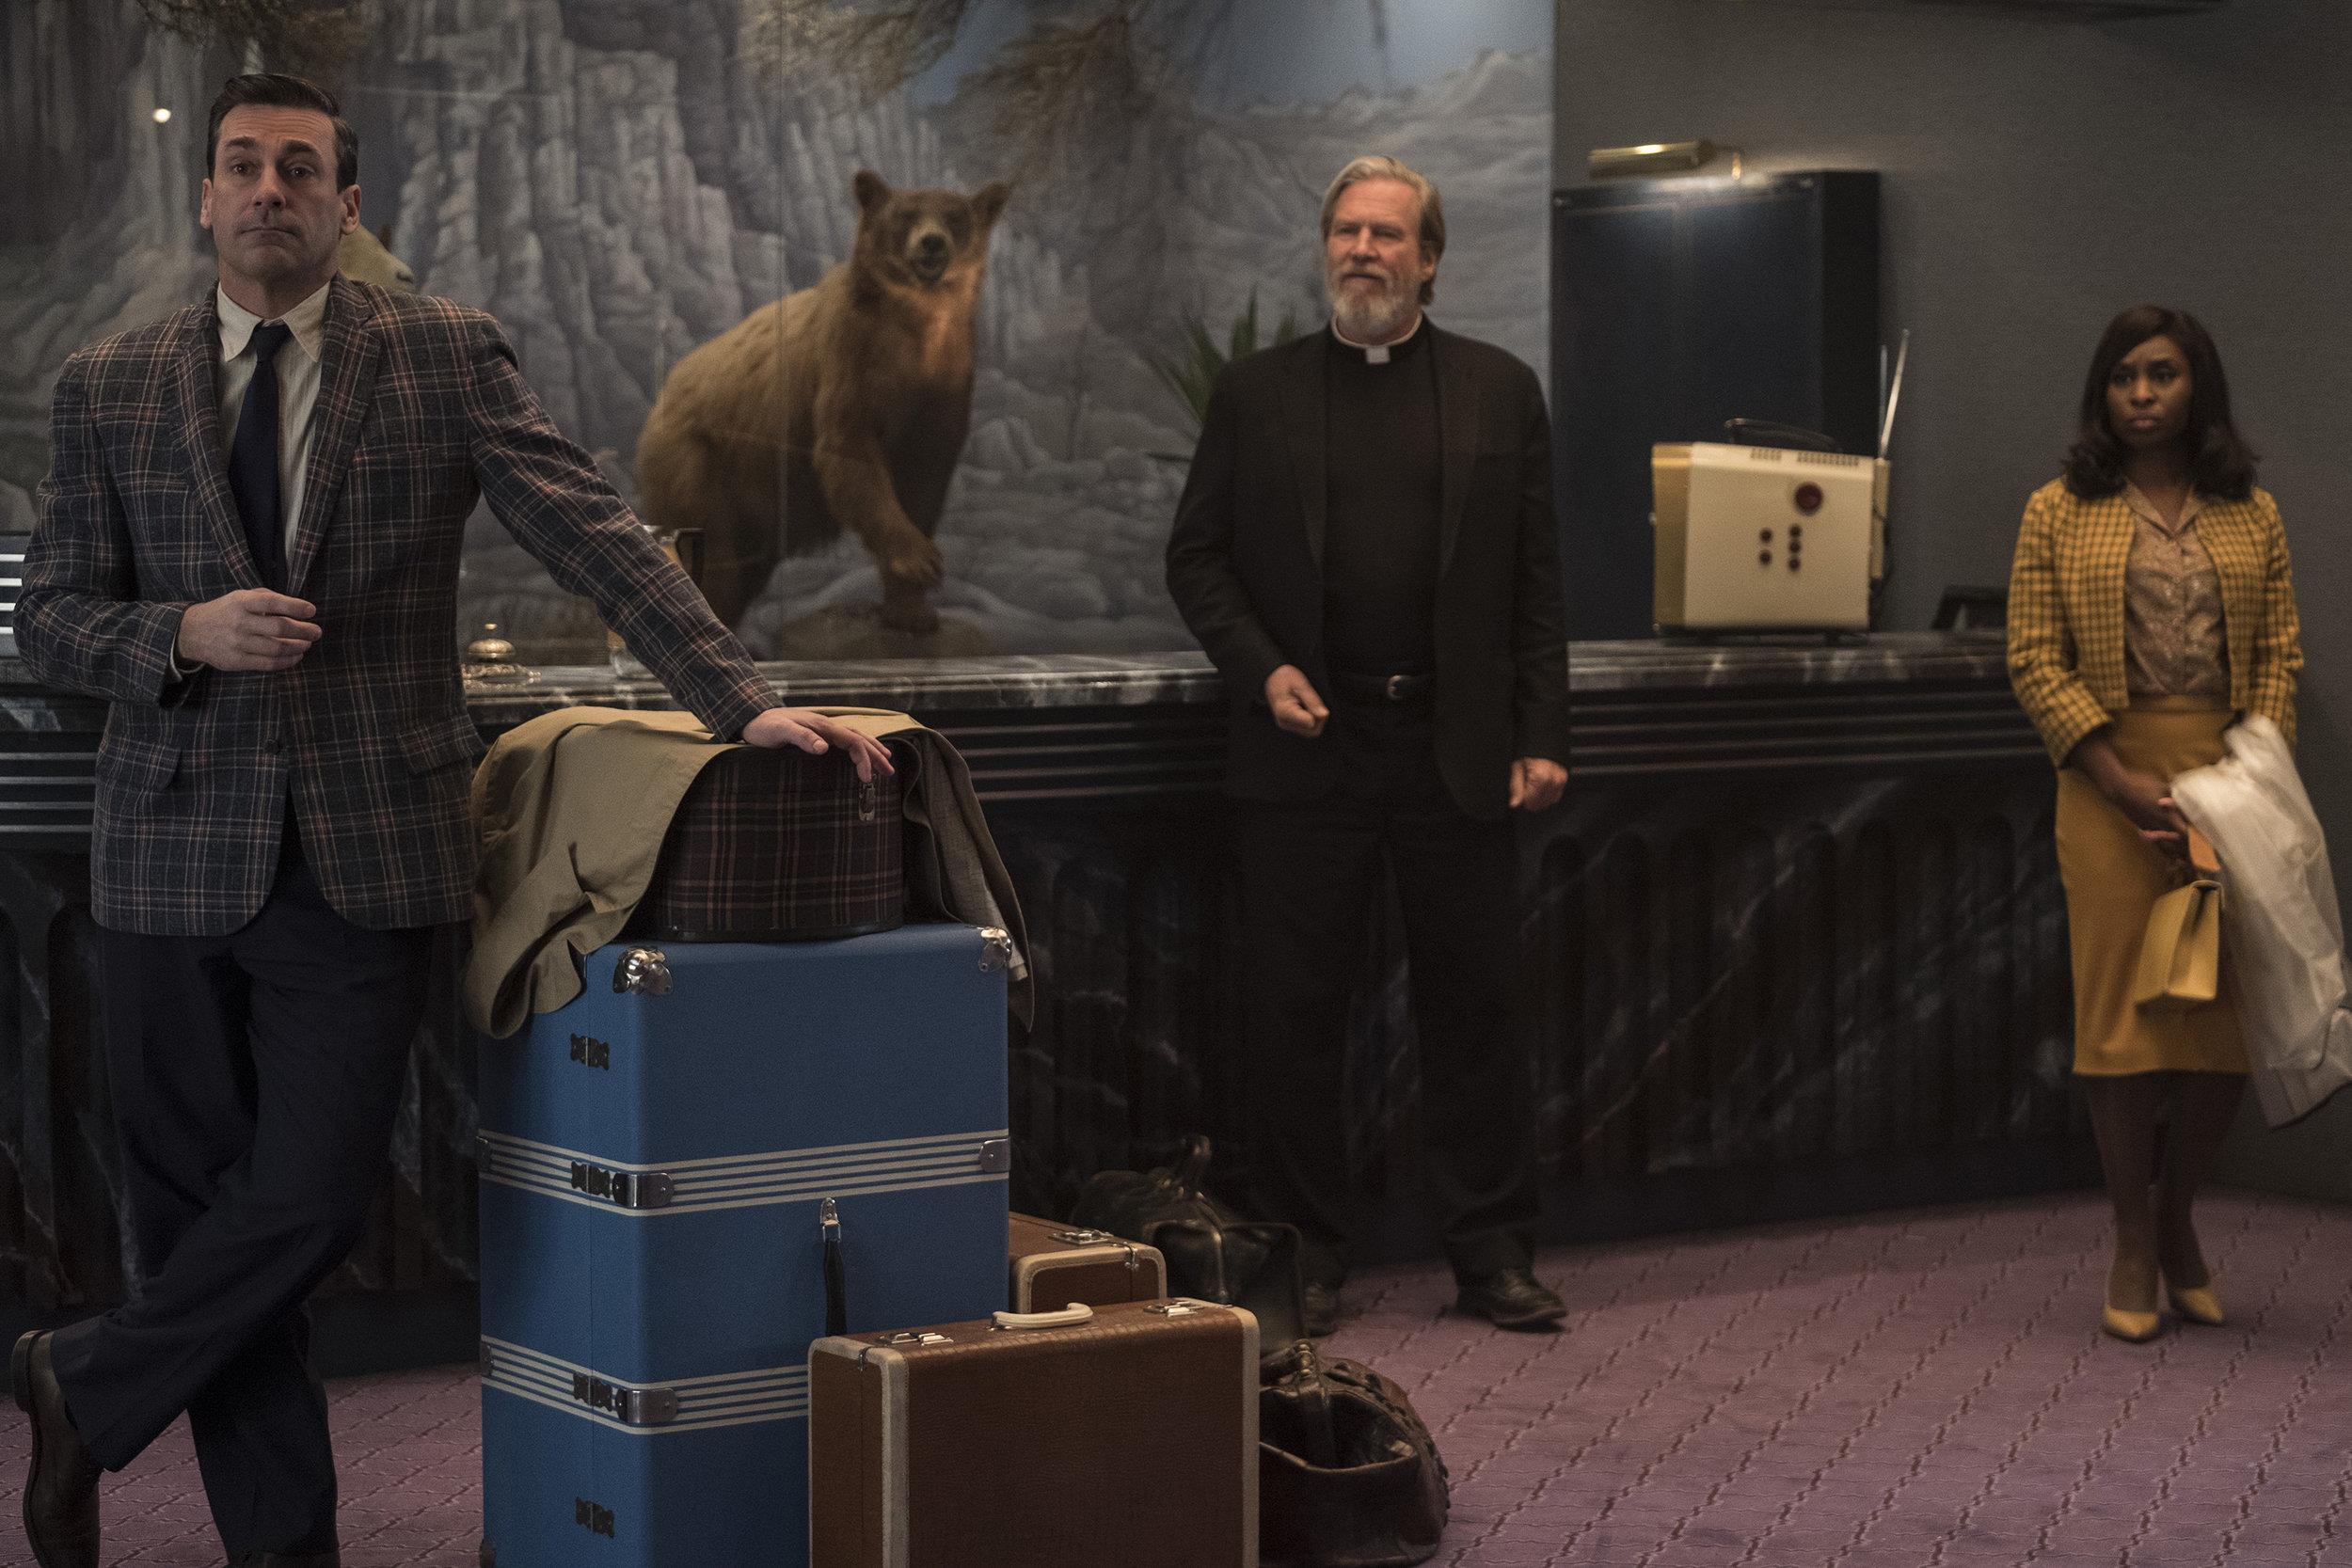 Jon Hamm, Jeff Bridges, and Cynthia Erivo | 20th Century Fox